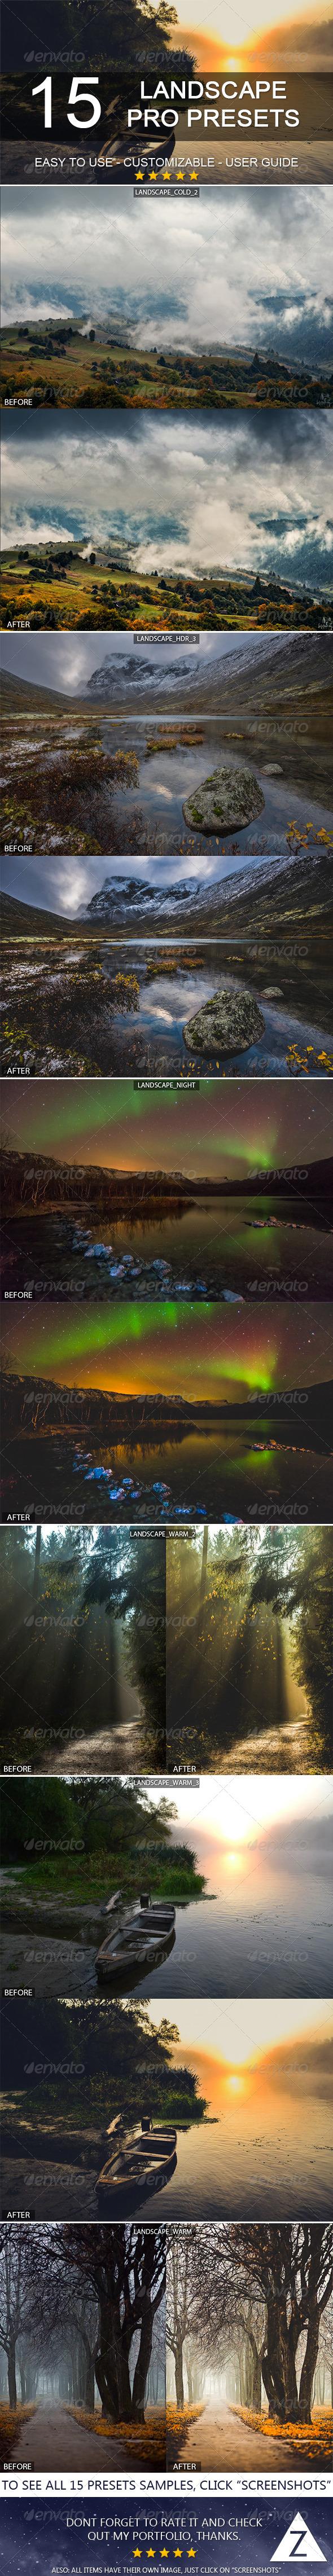 GraphicRiver 15 Pro Landscape Presets 6353457